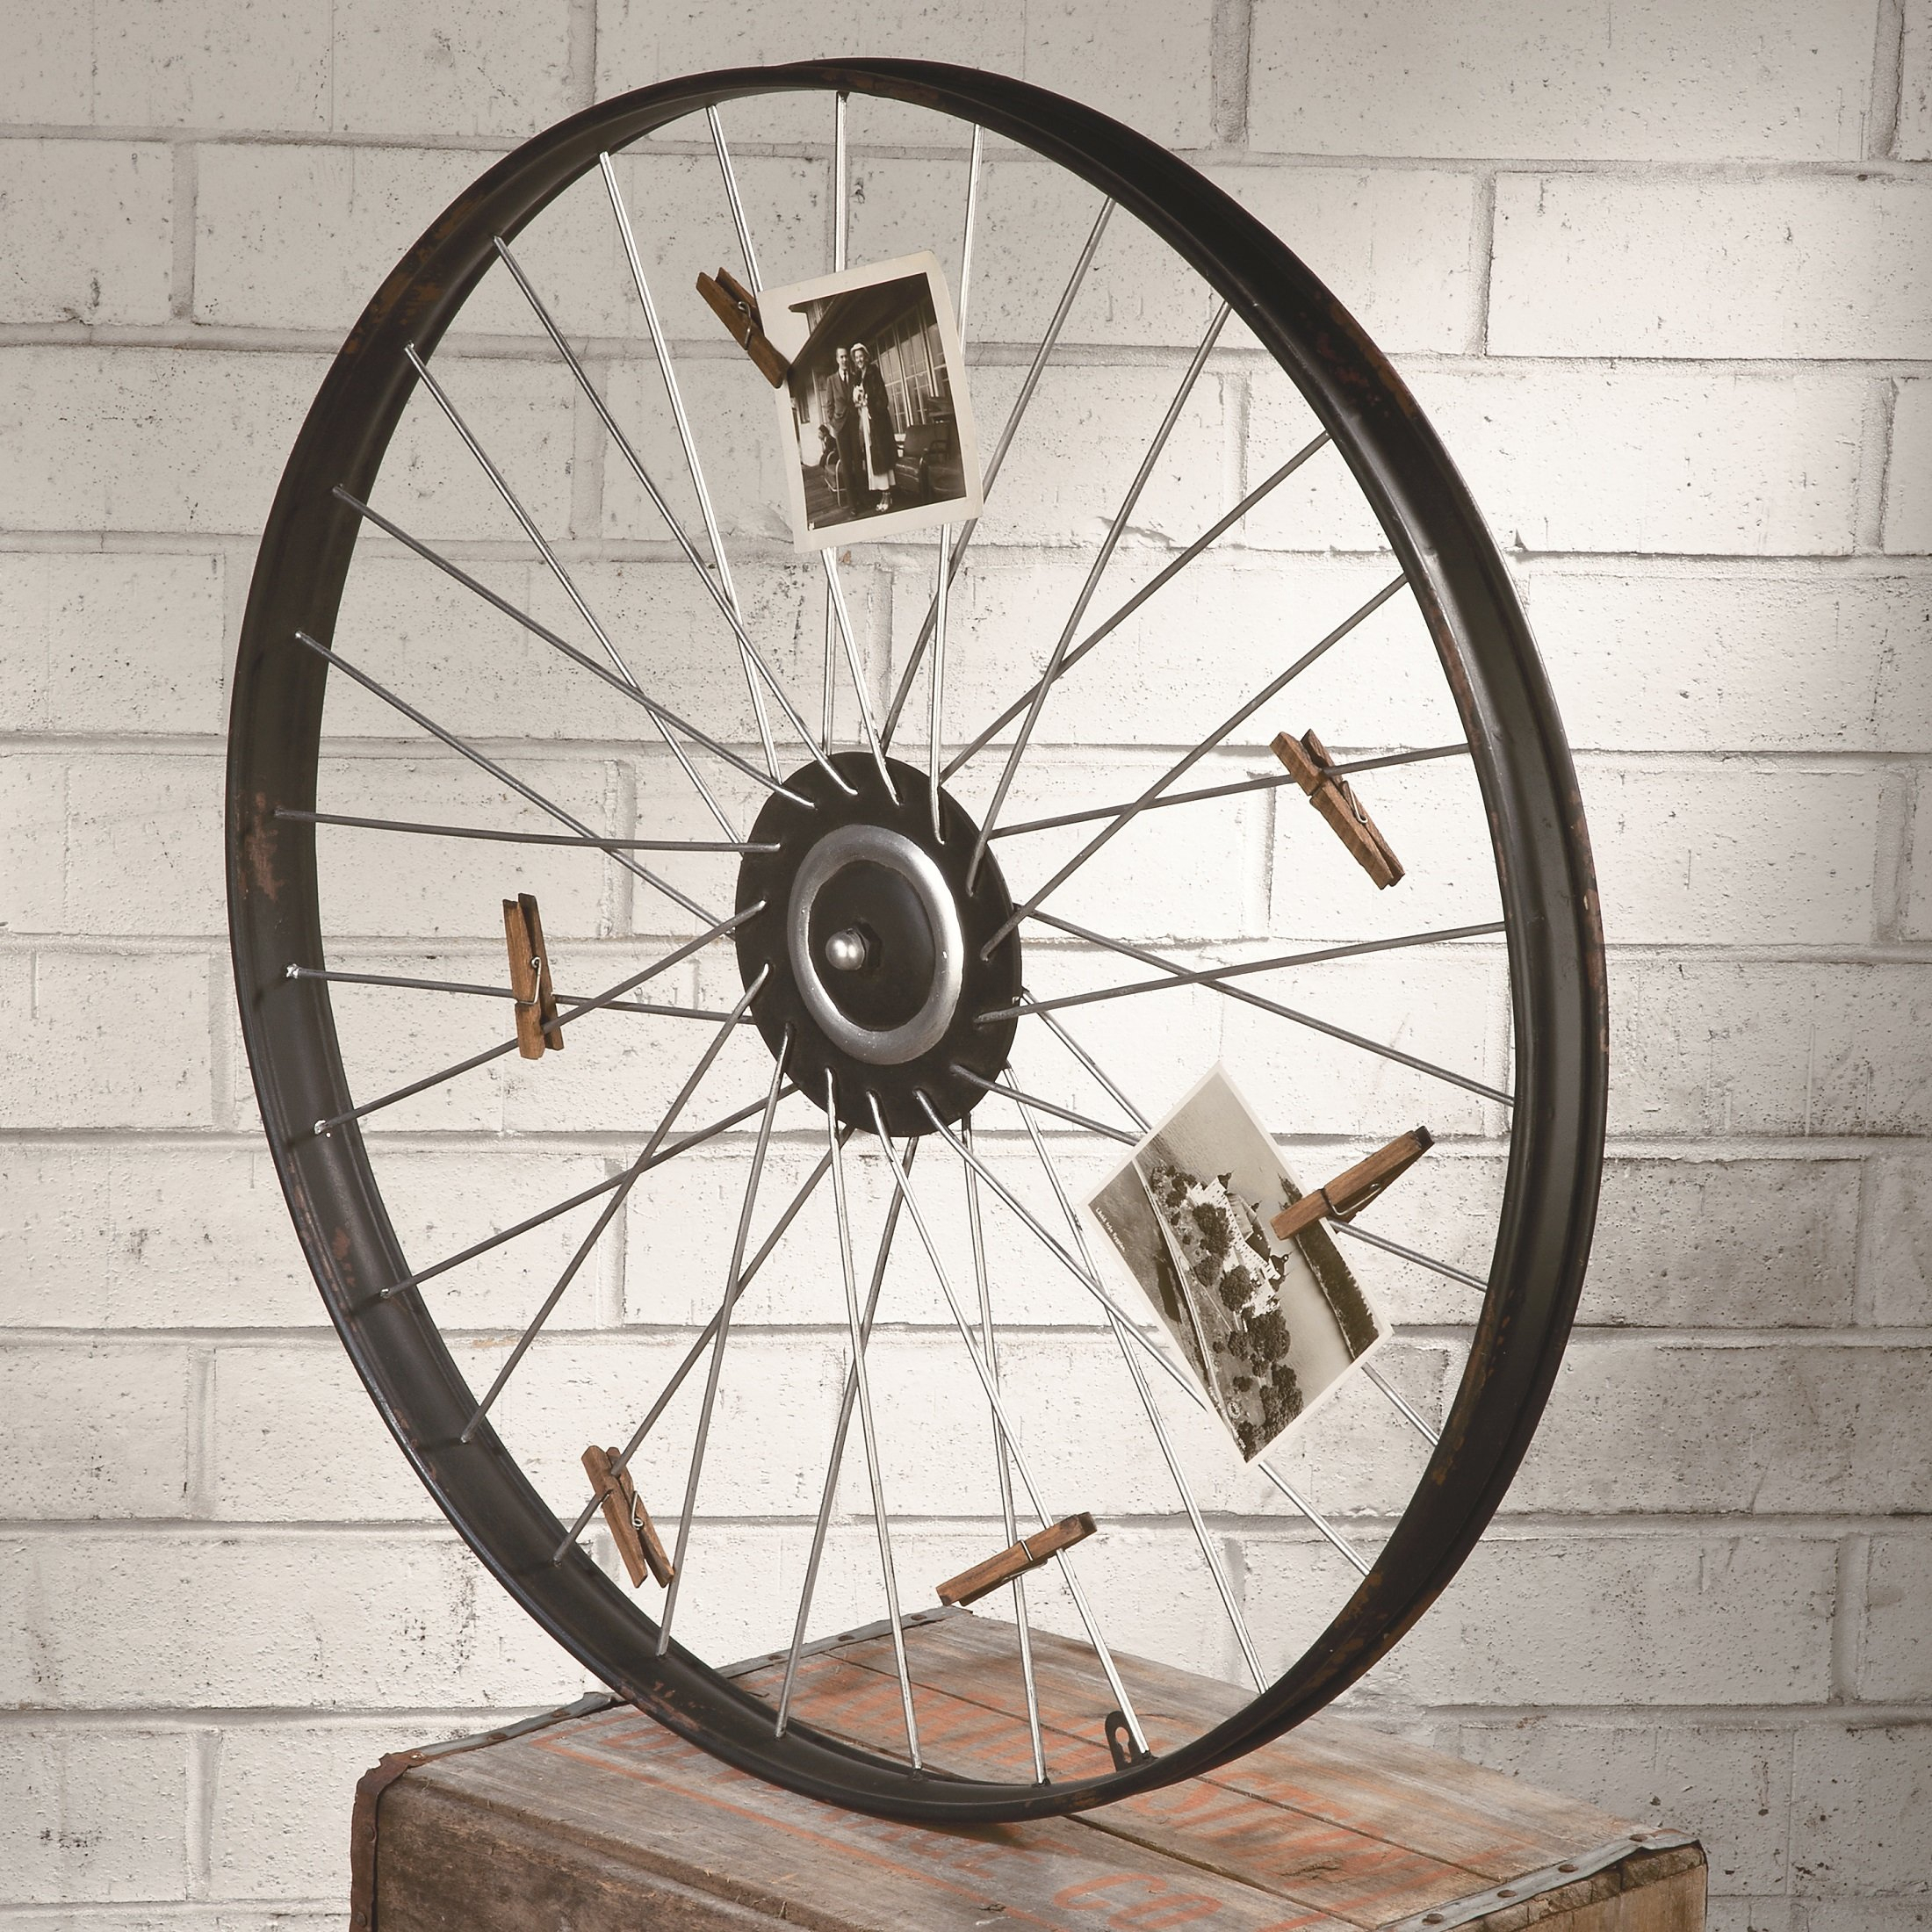 Bike Wheel Wall Decor | Wayfair inside 4 Piece Handwoven Wheel Wall Decor Sets (Image 5 of 30)